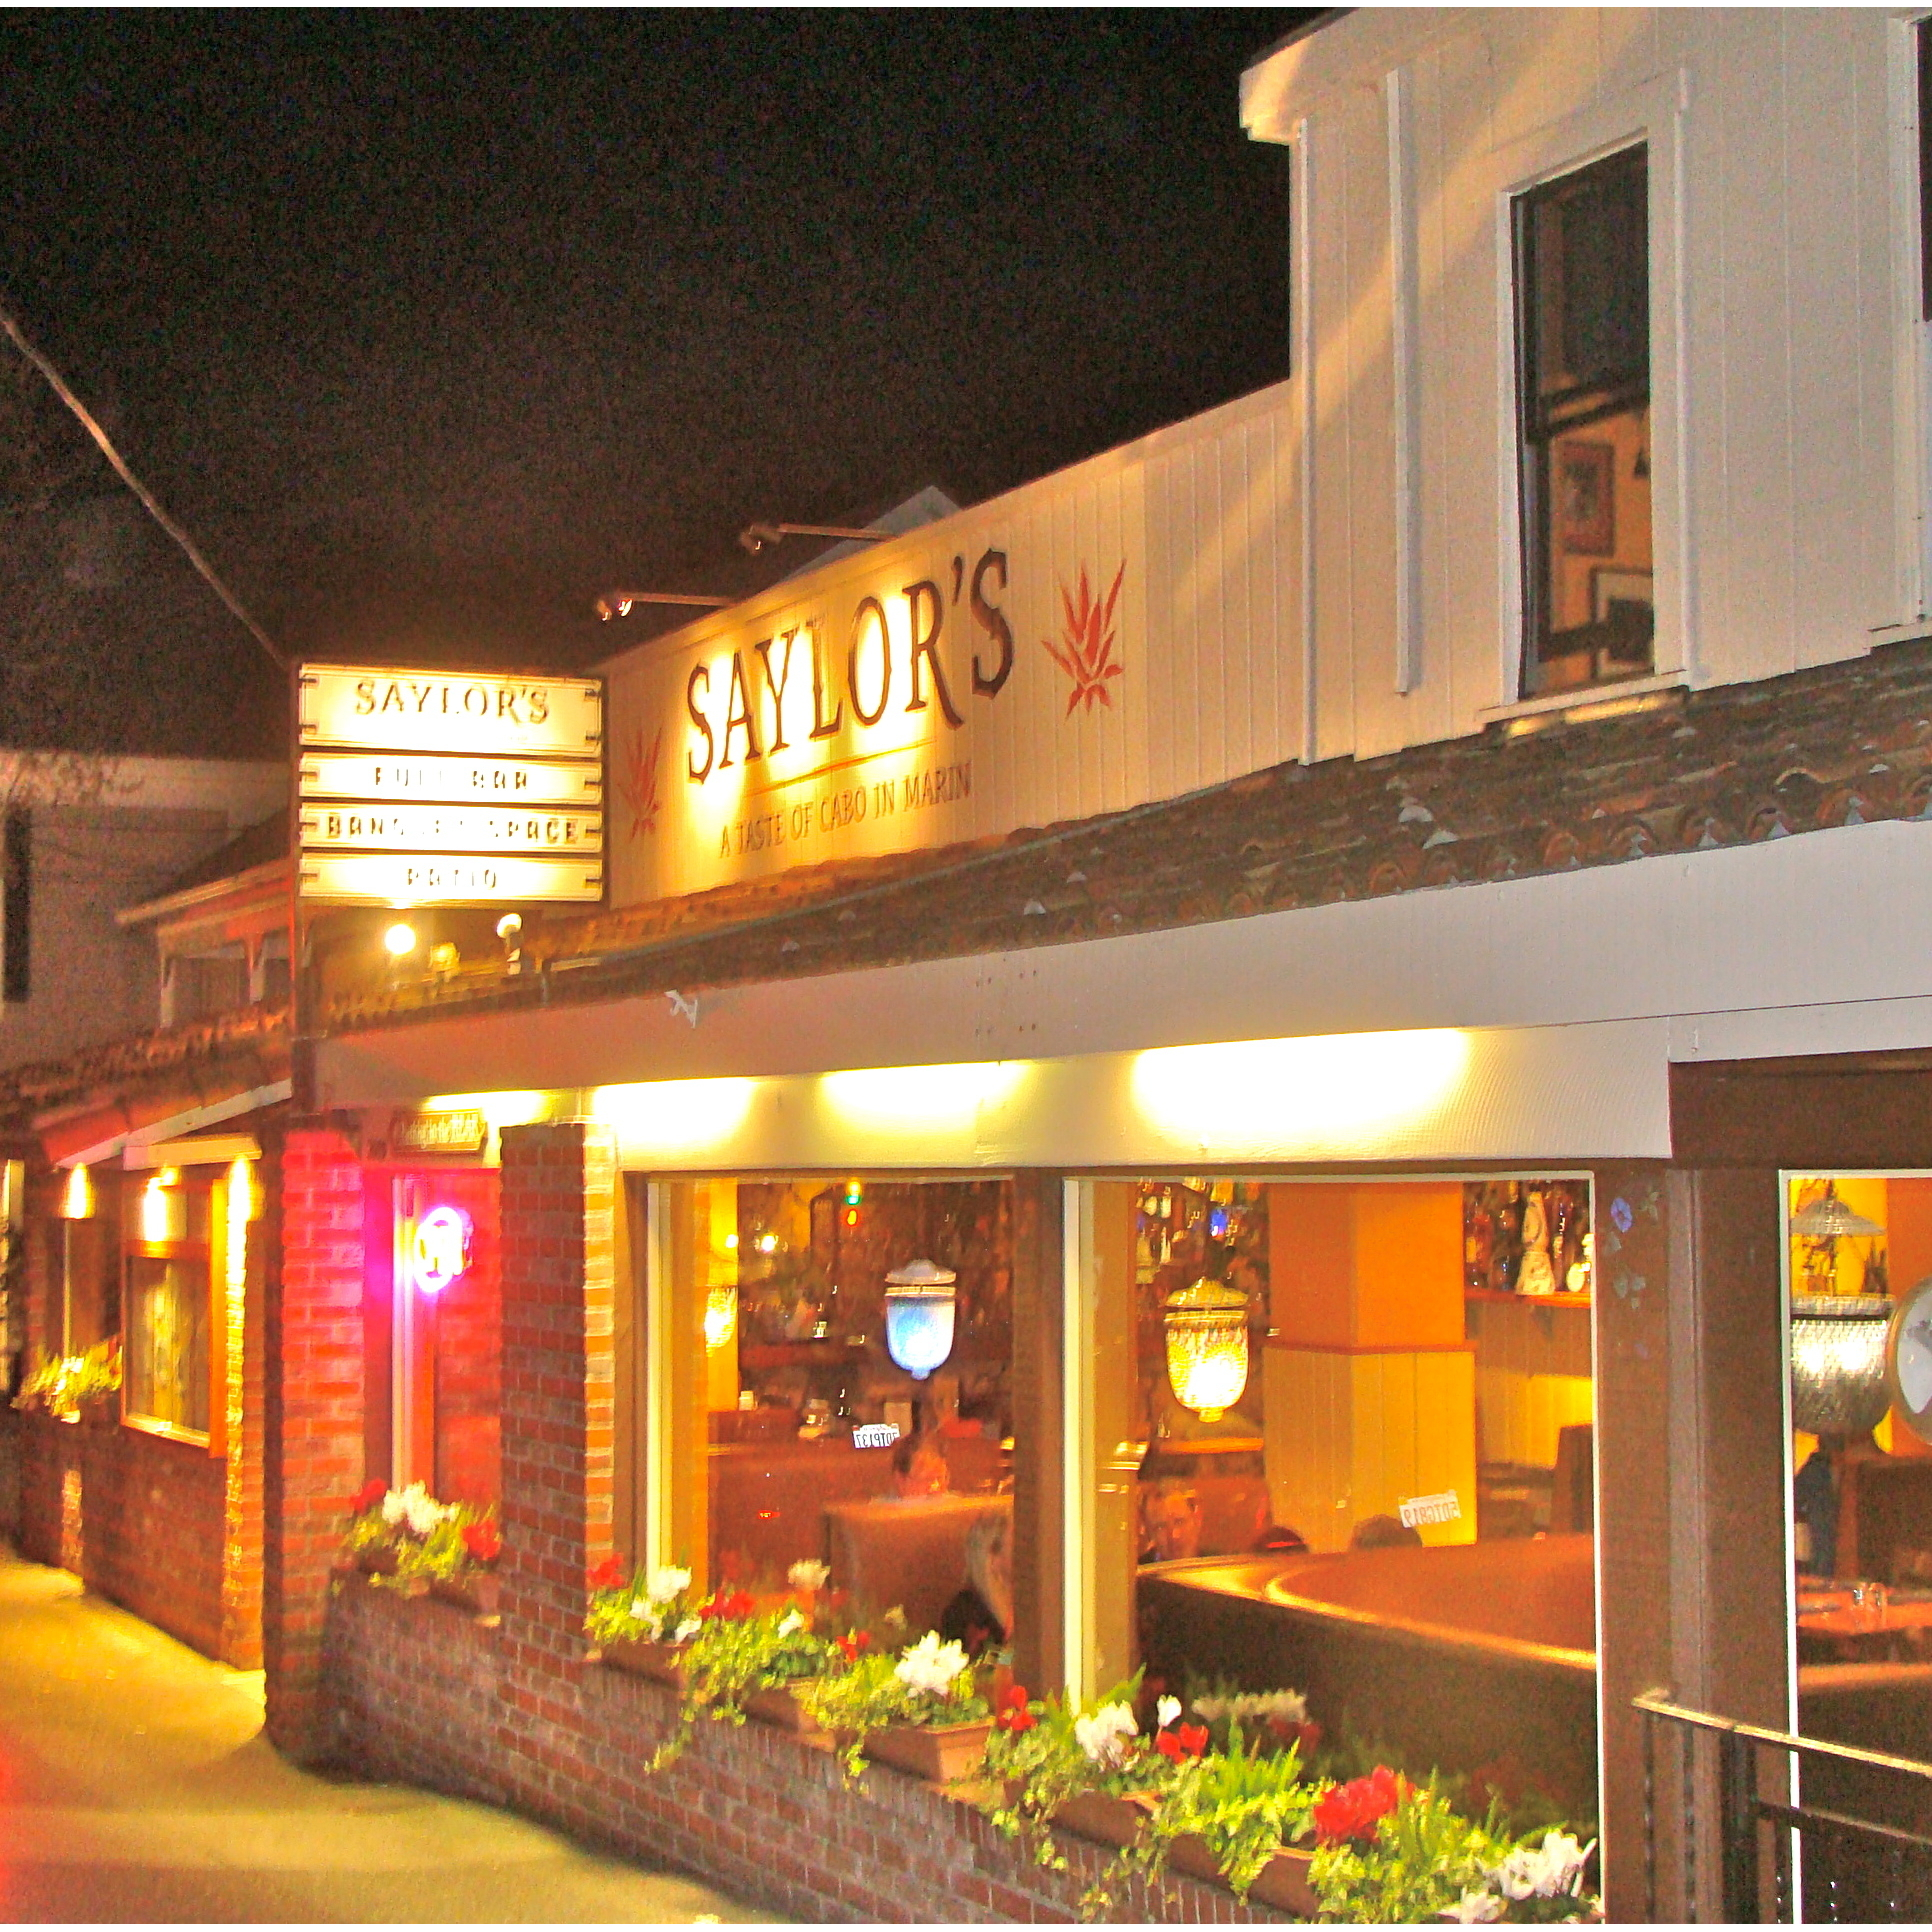 Saylor's Restaurant & Bar